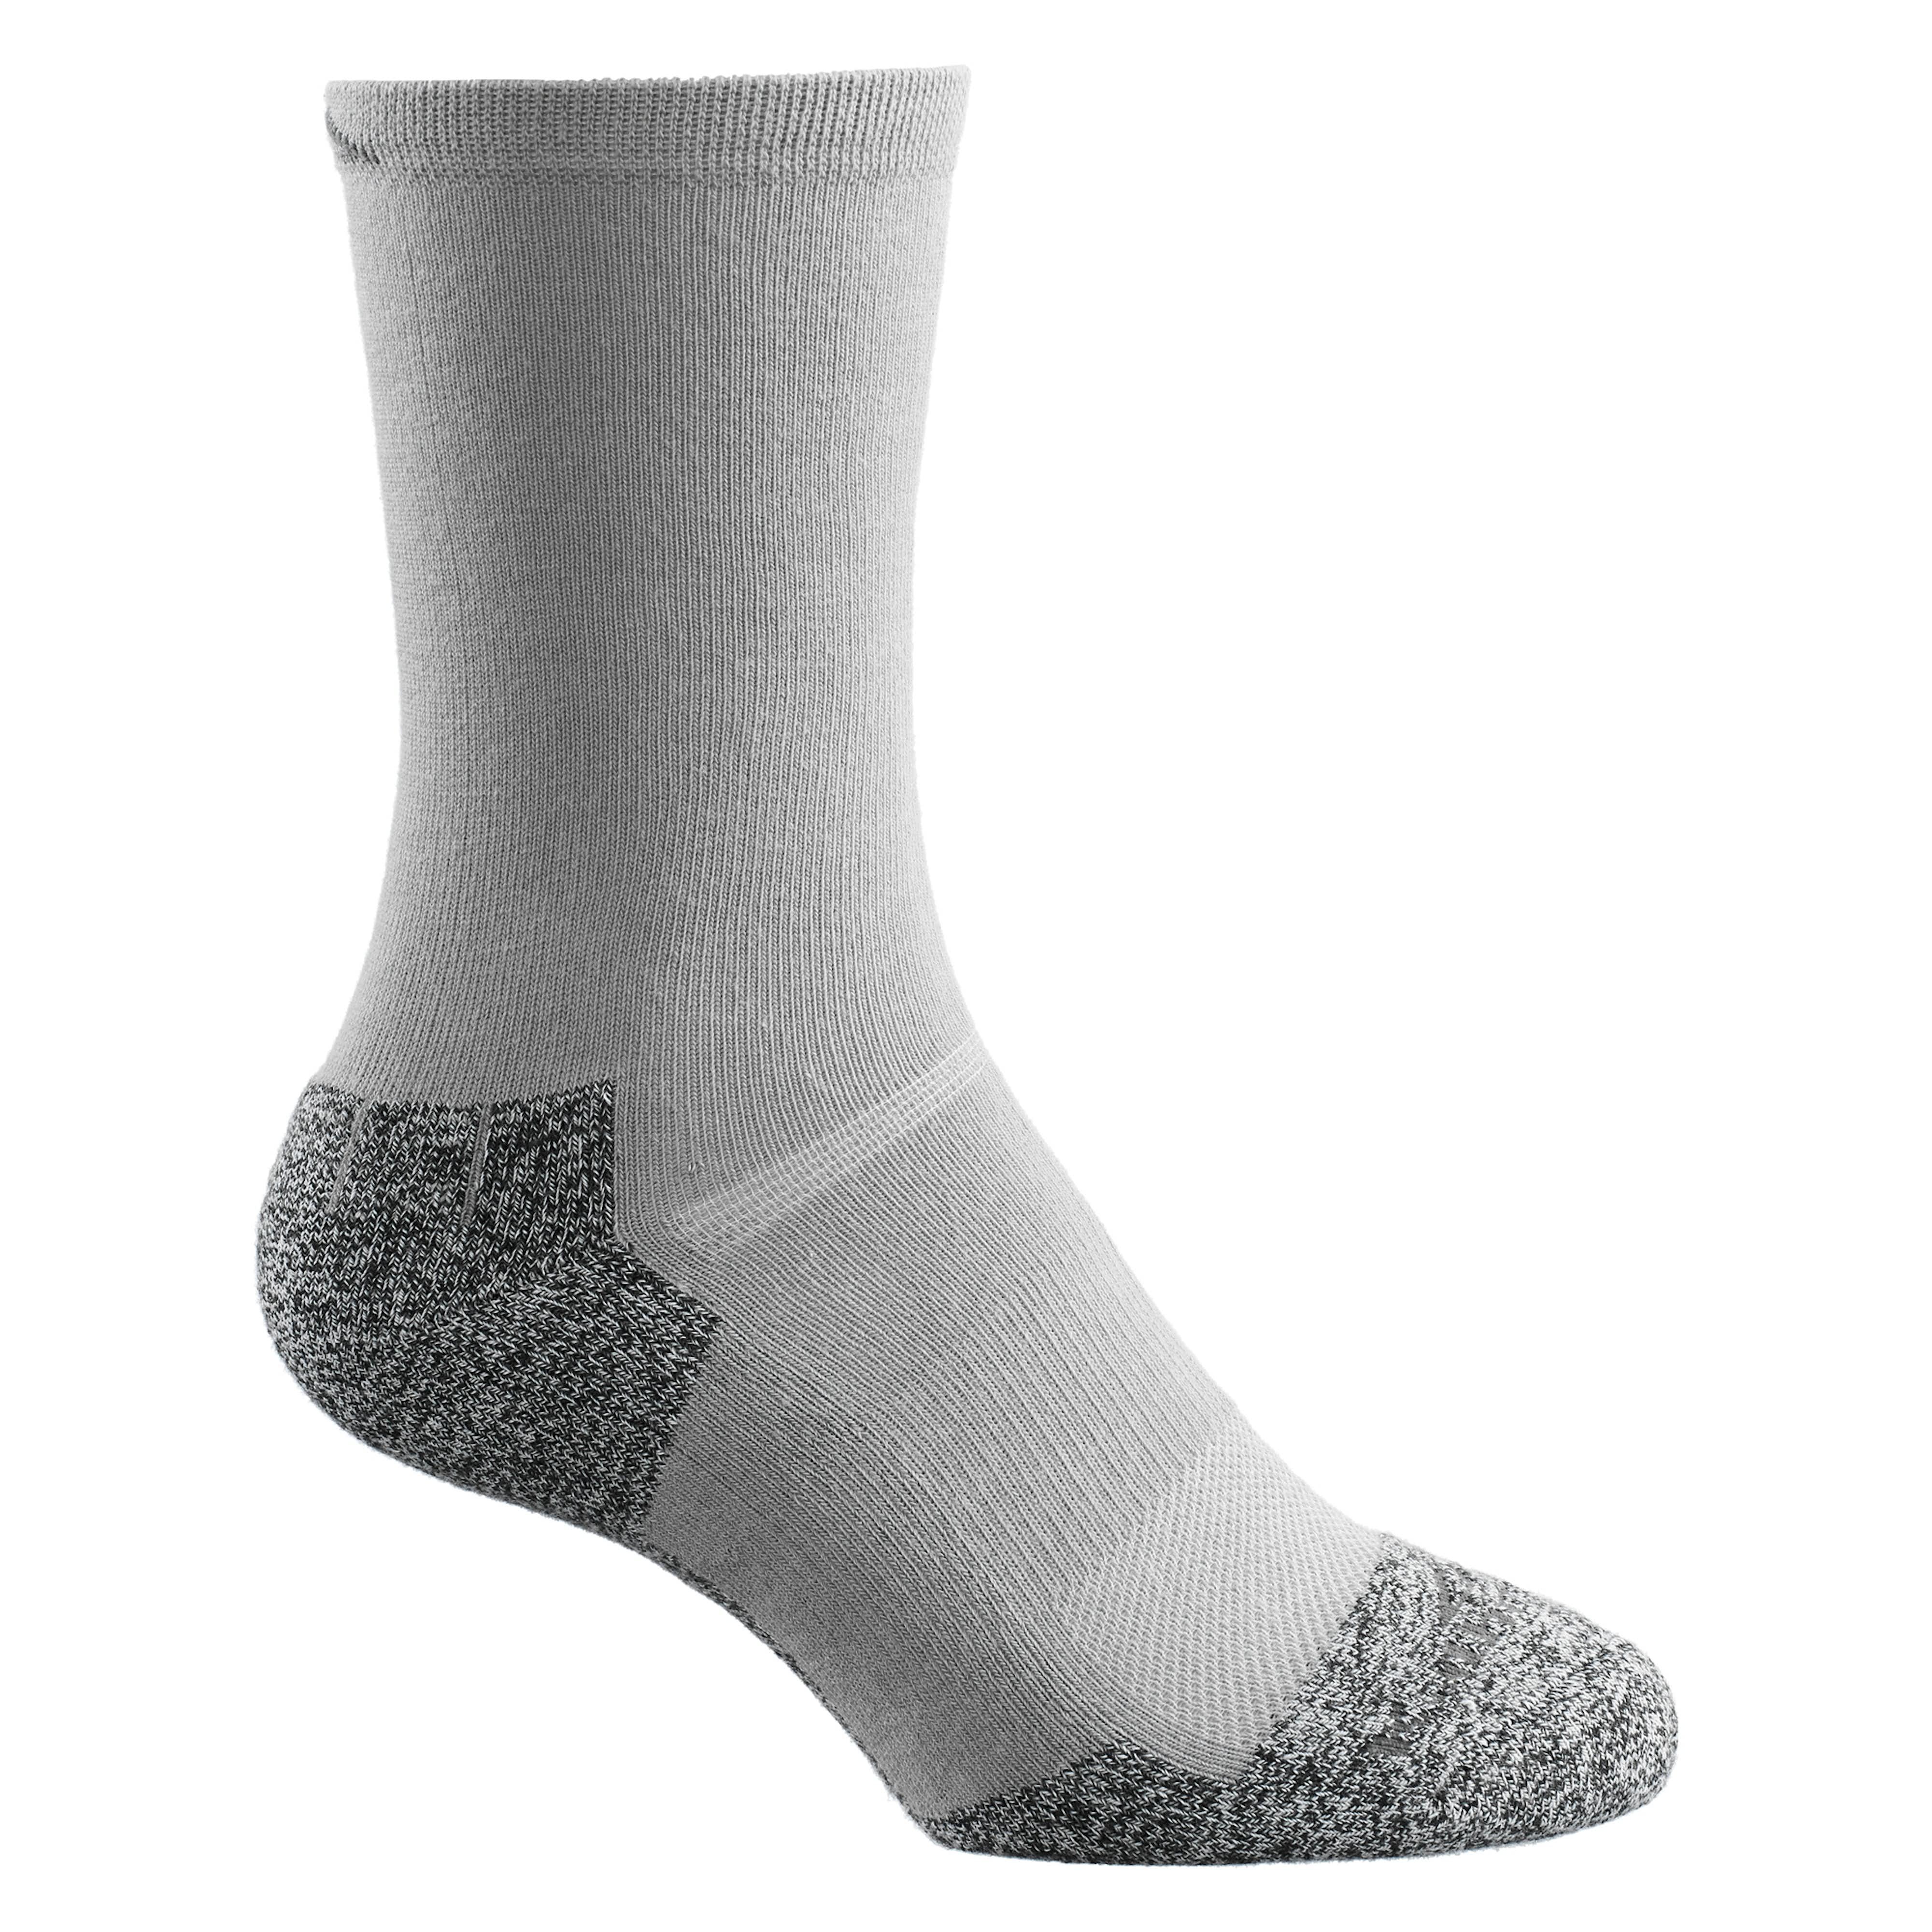 d4d4787a647c3 Hiking & Travel Socks | Merino Wool Socks | Kathmandu AU